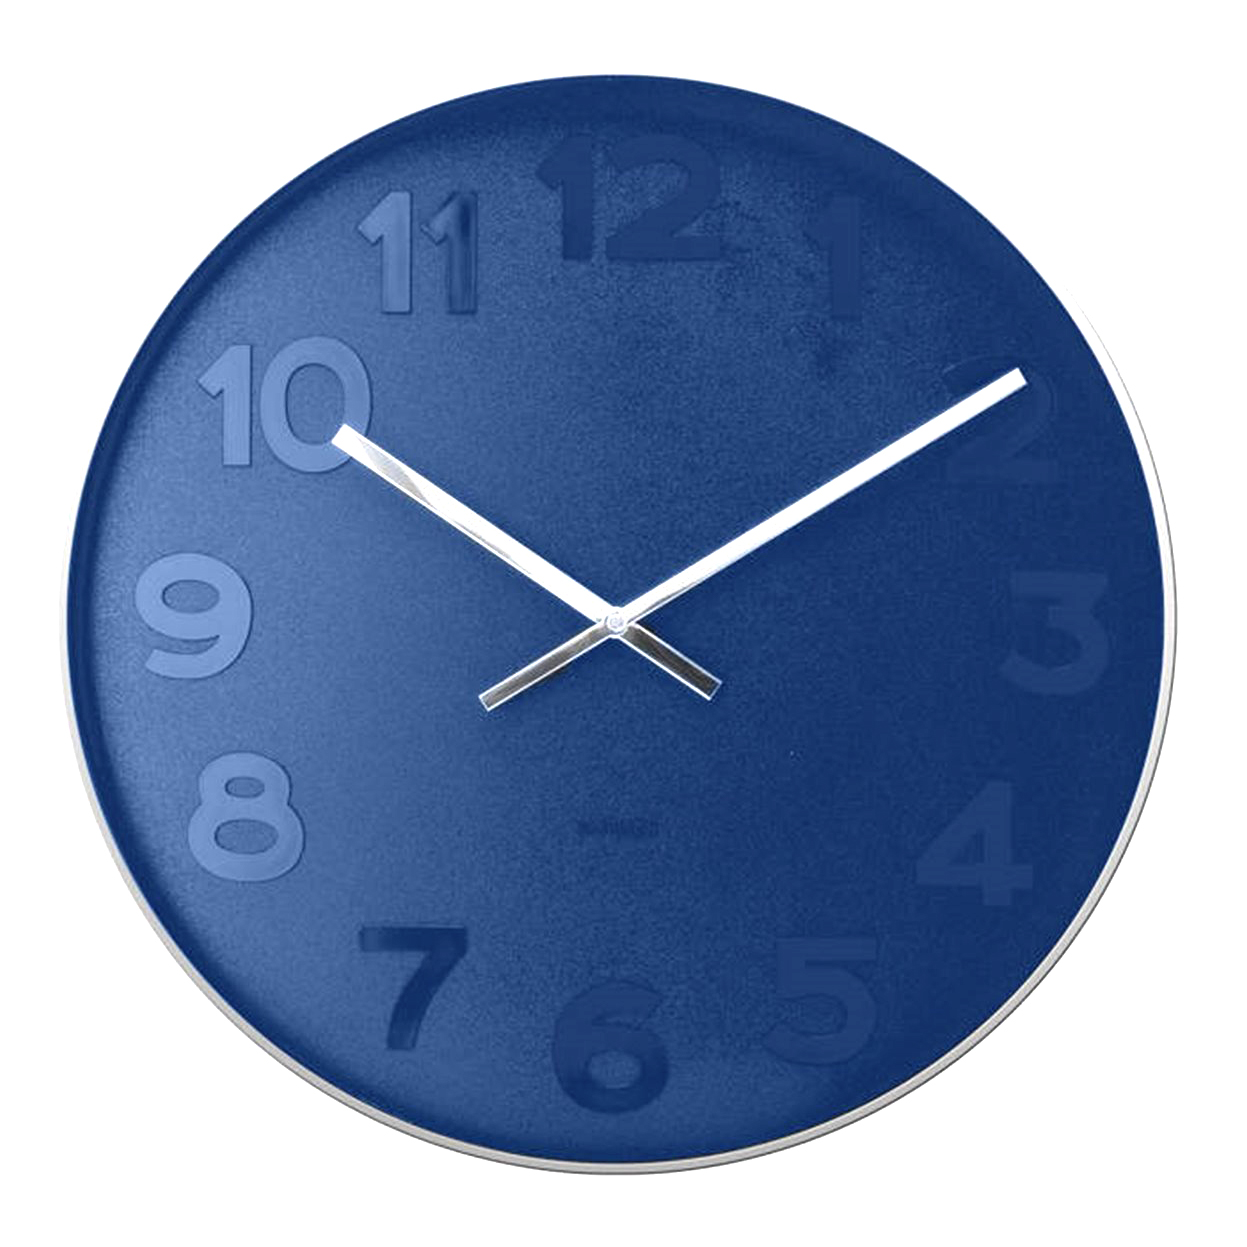 Karlsson Mr Blue numbers steel rim wall clock - Ø 51 x 7 cm   the design gift shop